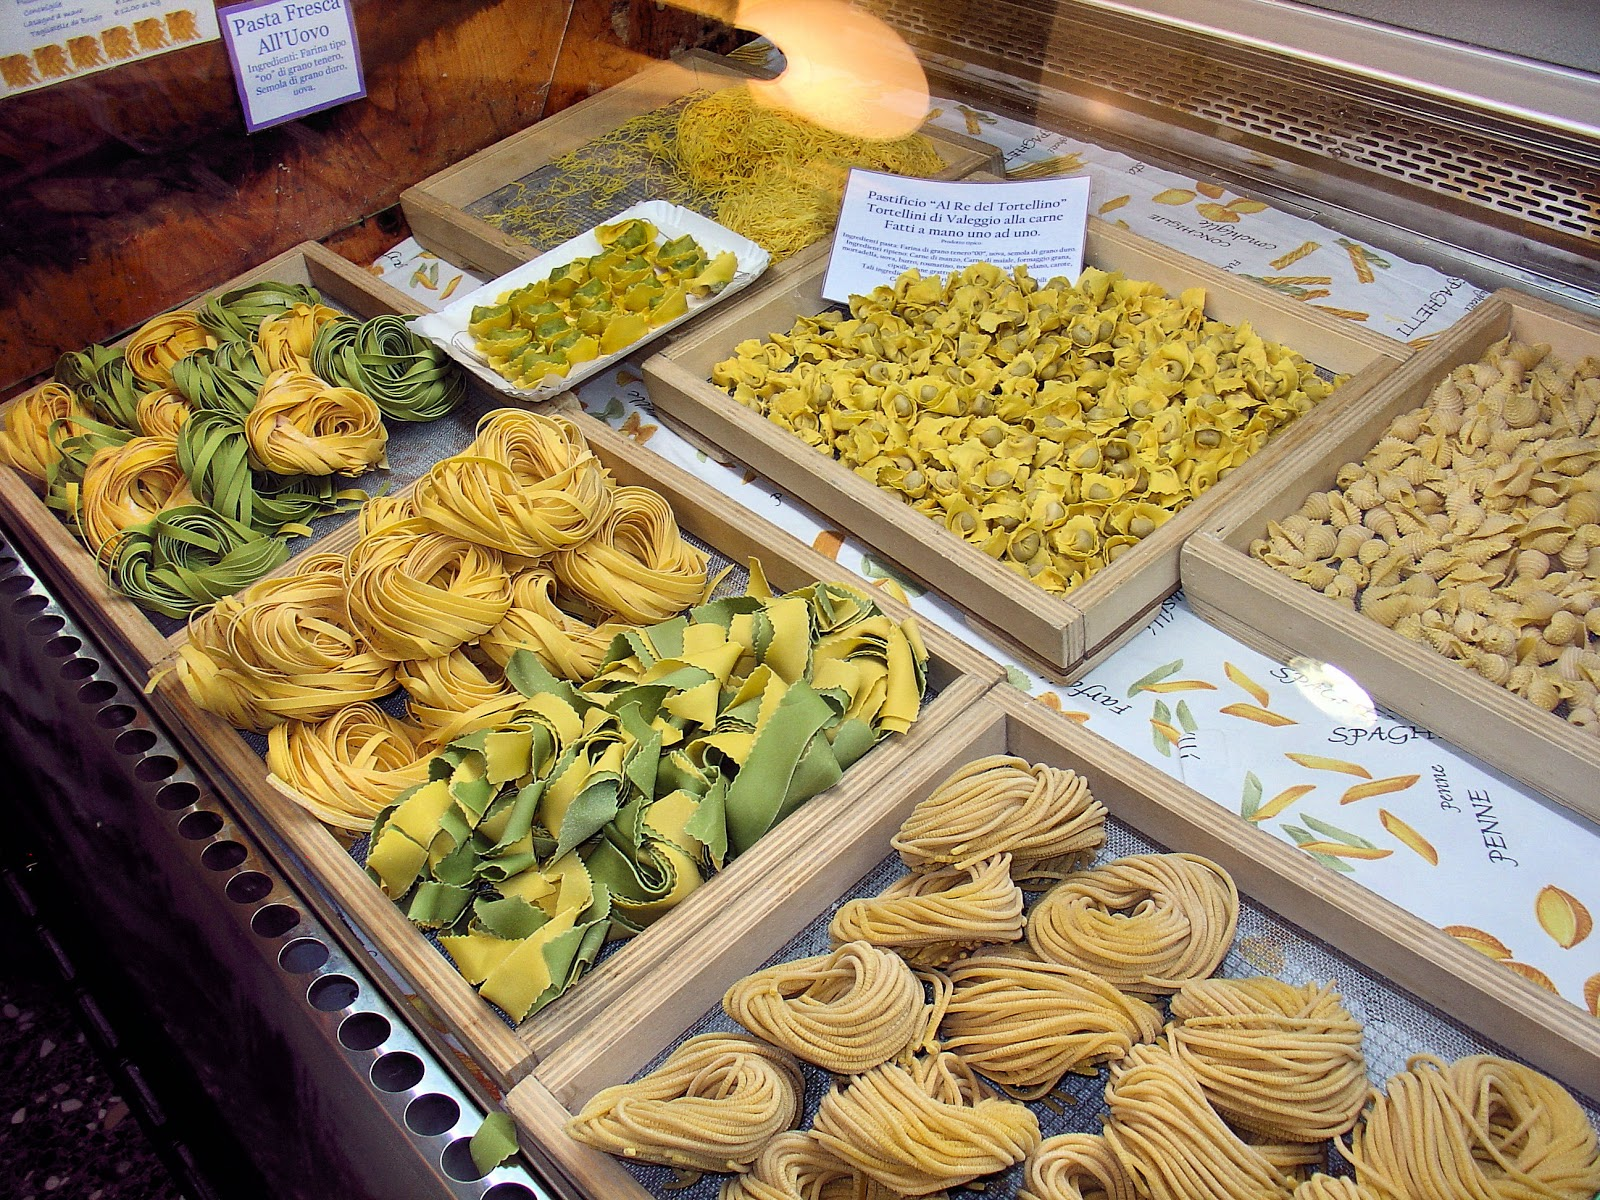 Scrumptious homemade pasta fills the cases inside Al Re de Tortellino.